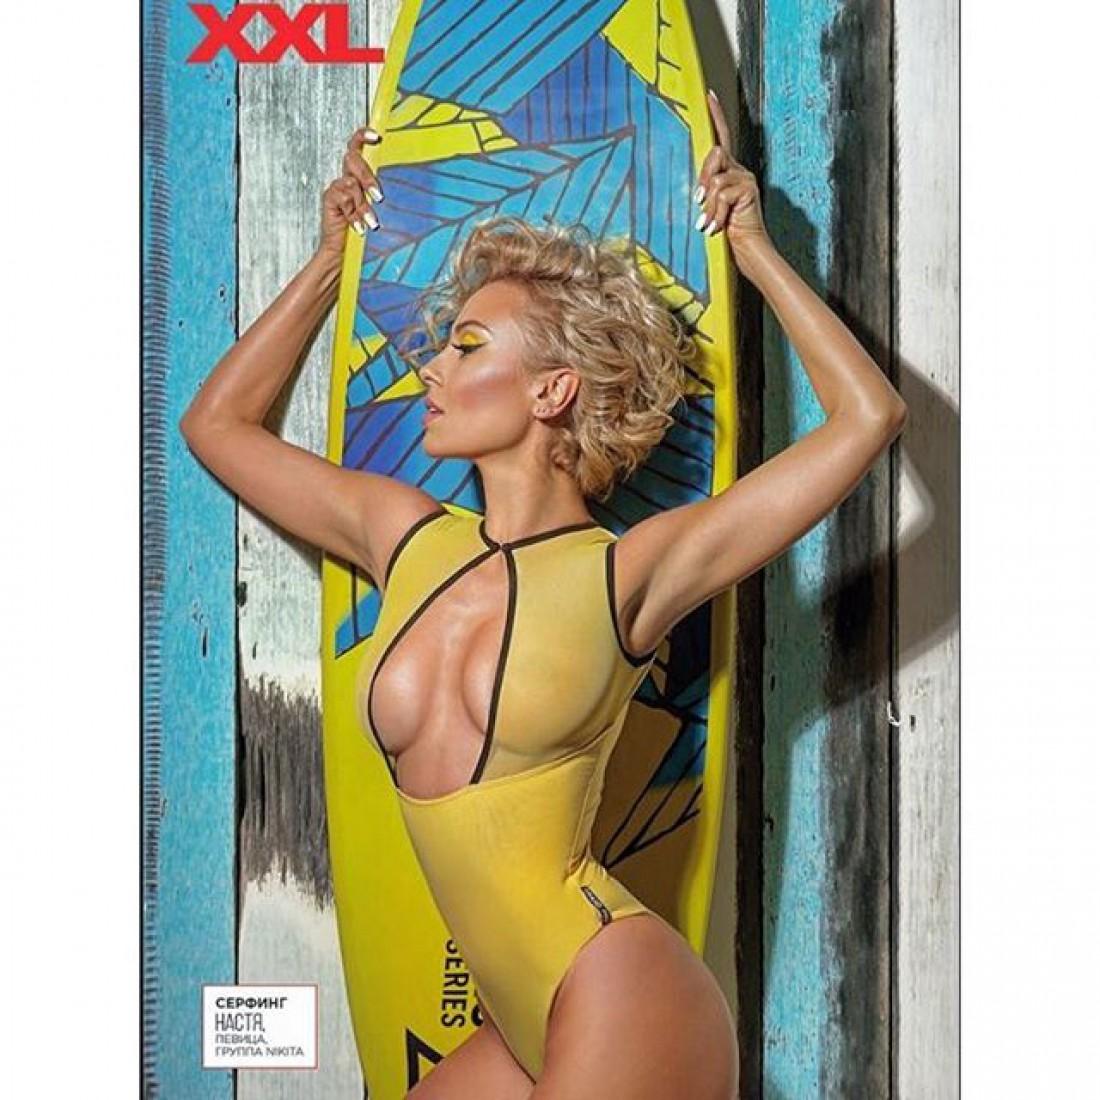 Сексуальная Нана на страницах мужского журнала